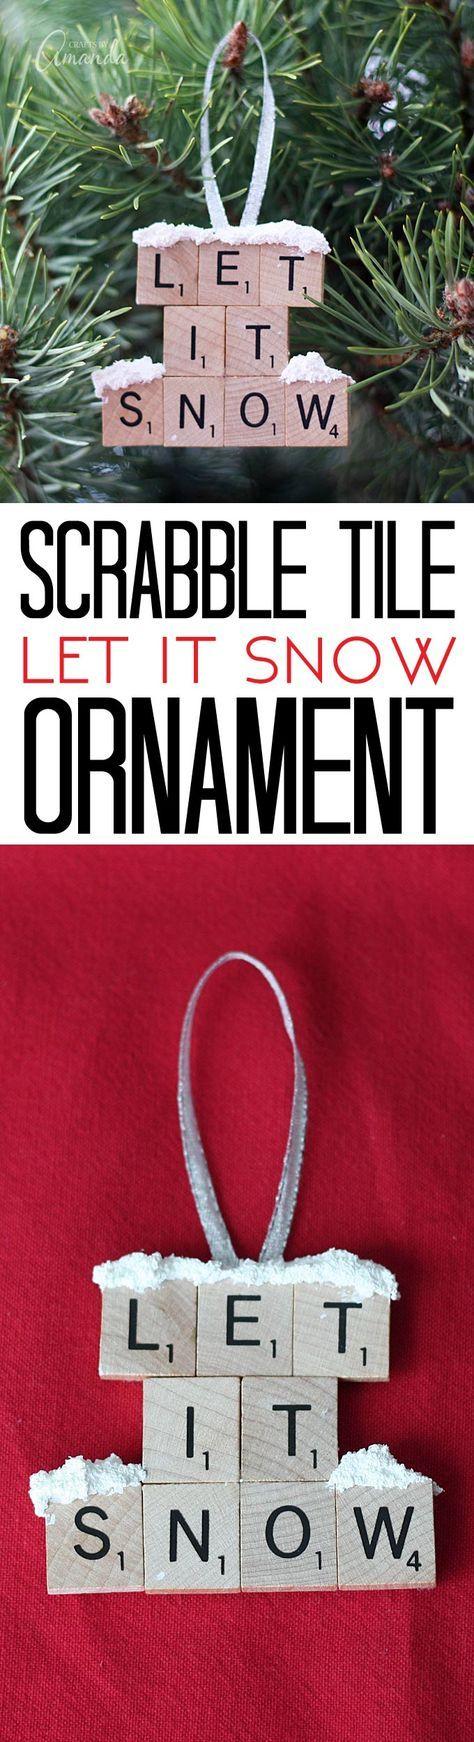 Let it Snow – Scrabble Tile Ornament | 11 Easy Last Minute DIY Christmas Crafts